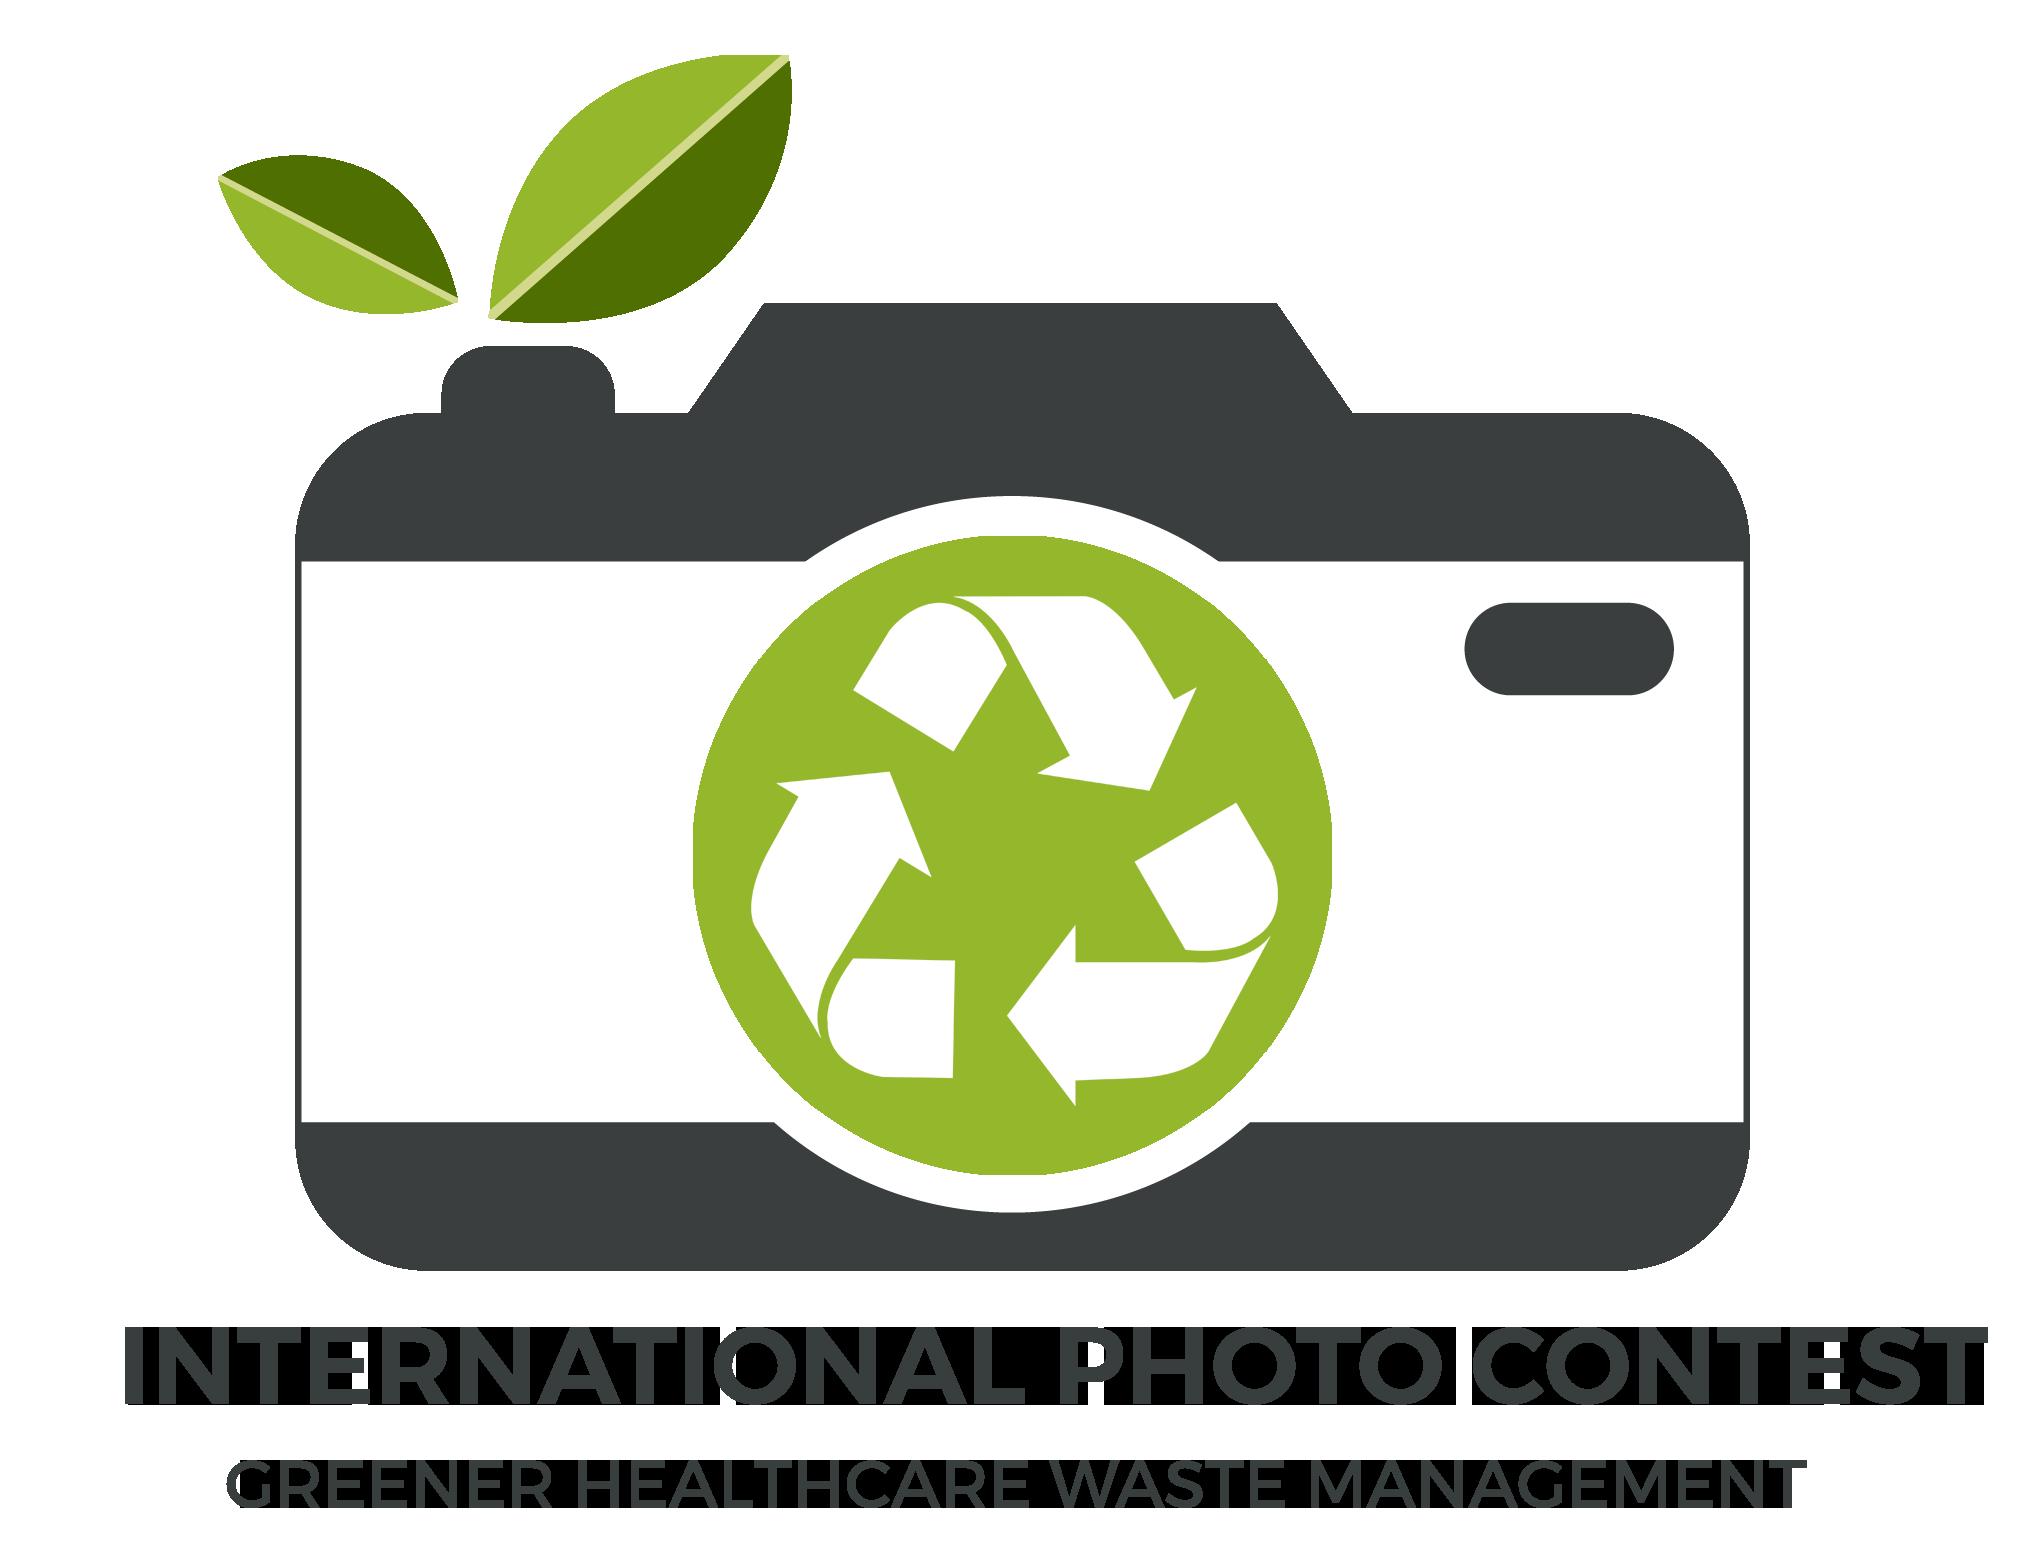 International Photo Contest on Greener Healthcare Waste Management - logo